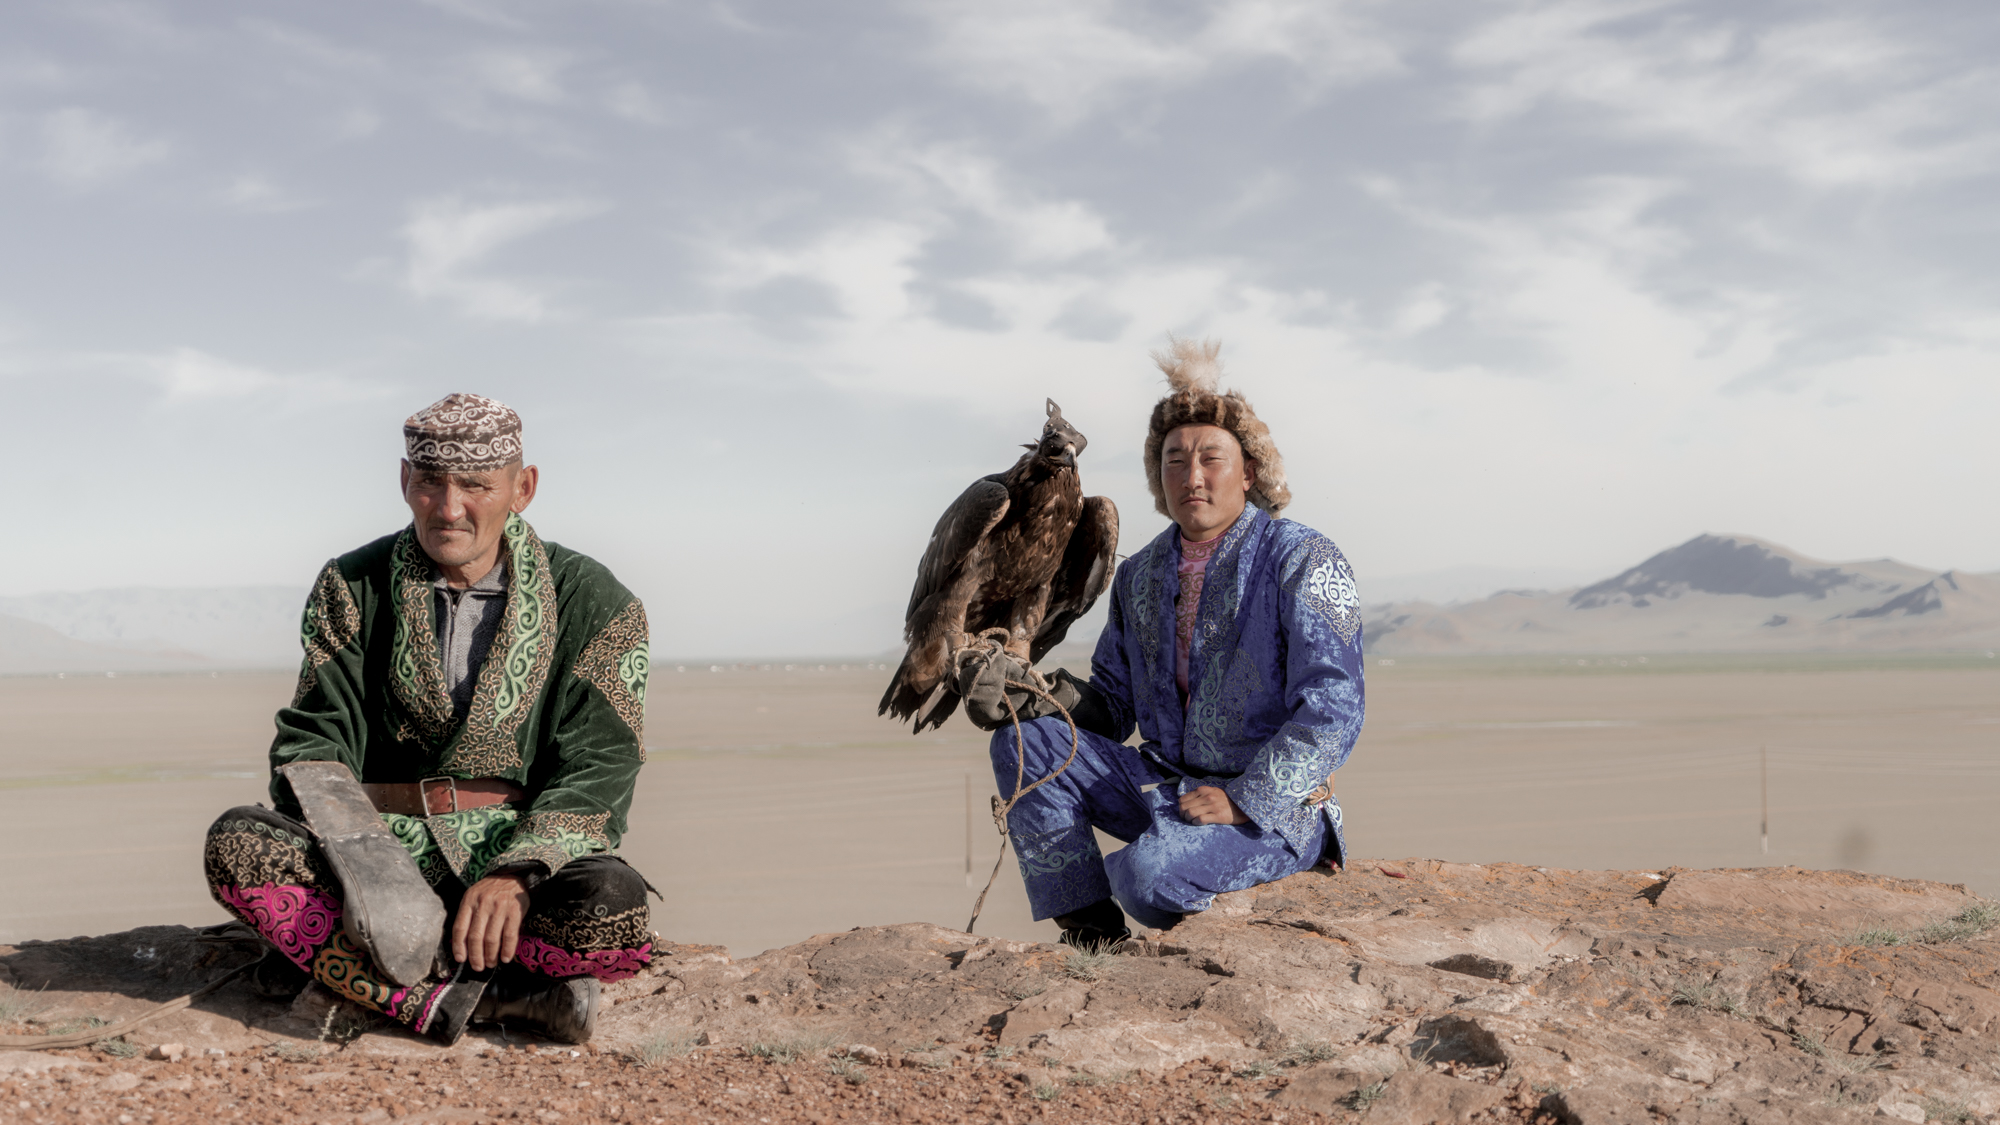 Mongolia 2017 Harry Fisch 2000sin título2017-04903.jpg